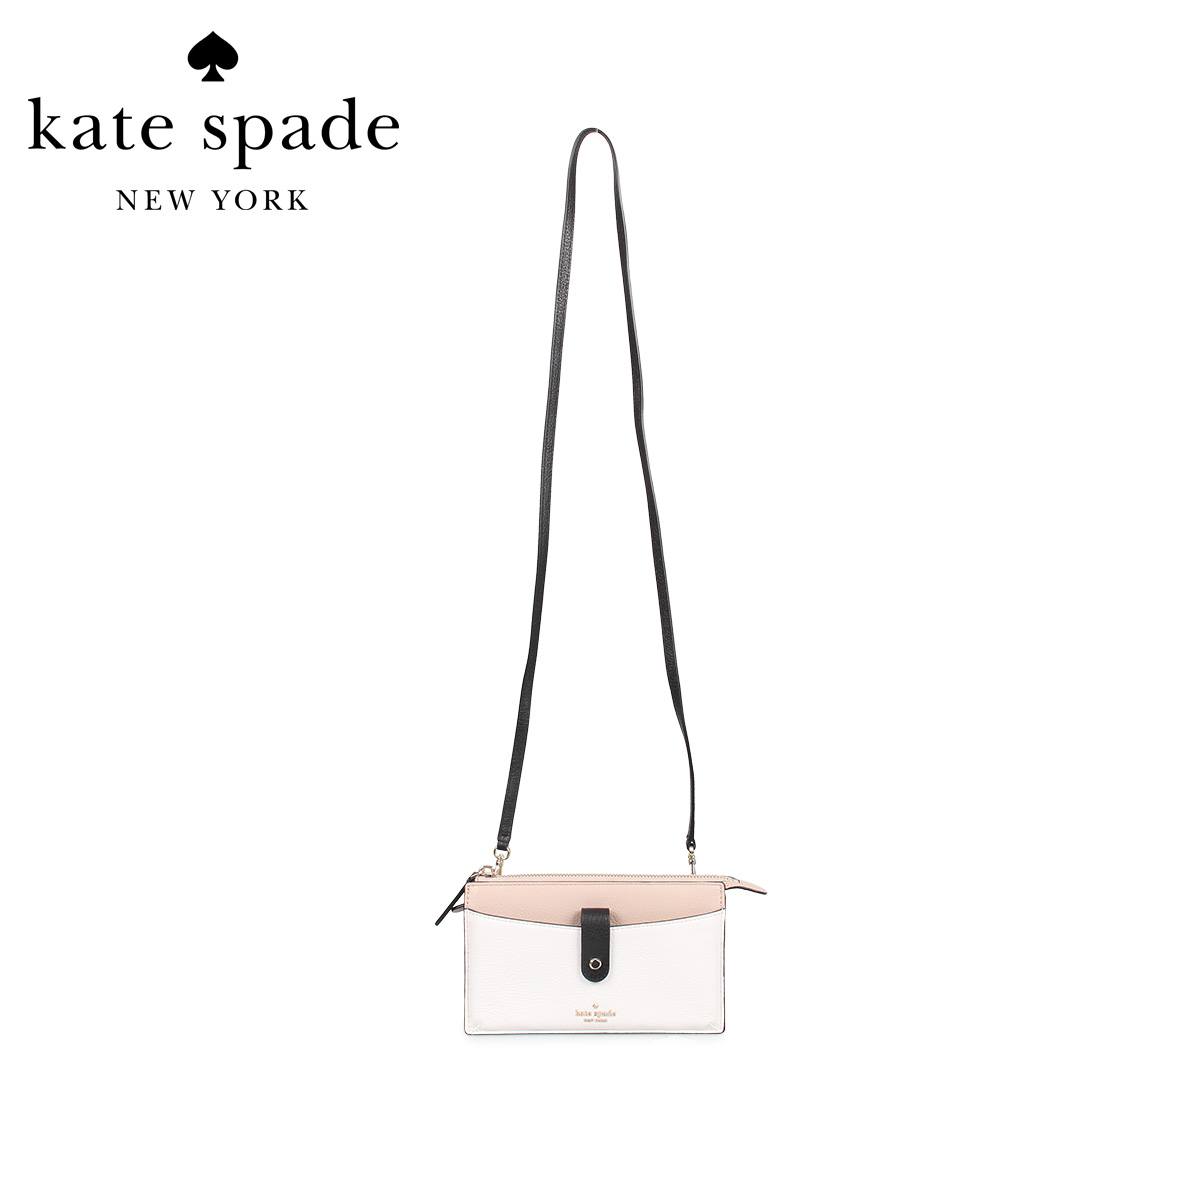 kate spade ケイトスペード バッグ ショルダーバッグ レディース SMALL TAB CROSSBODY ホワイト 白 WLRU5923 [3/13 新入荷]